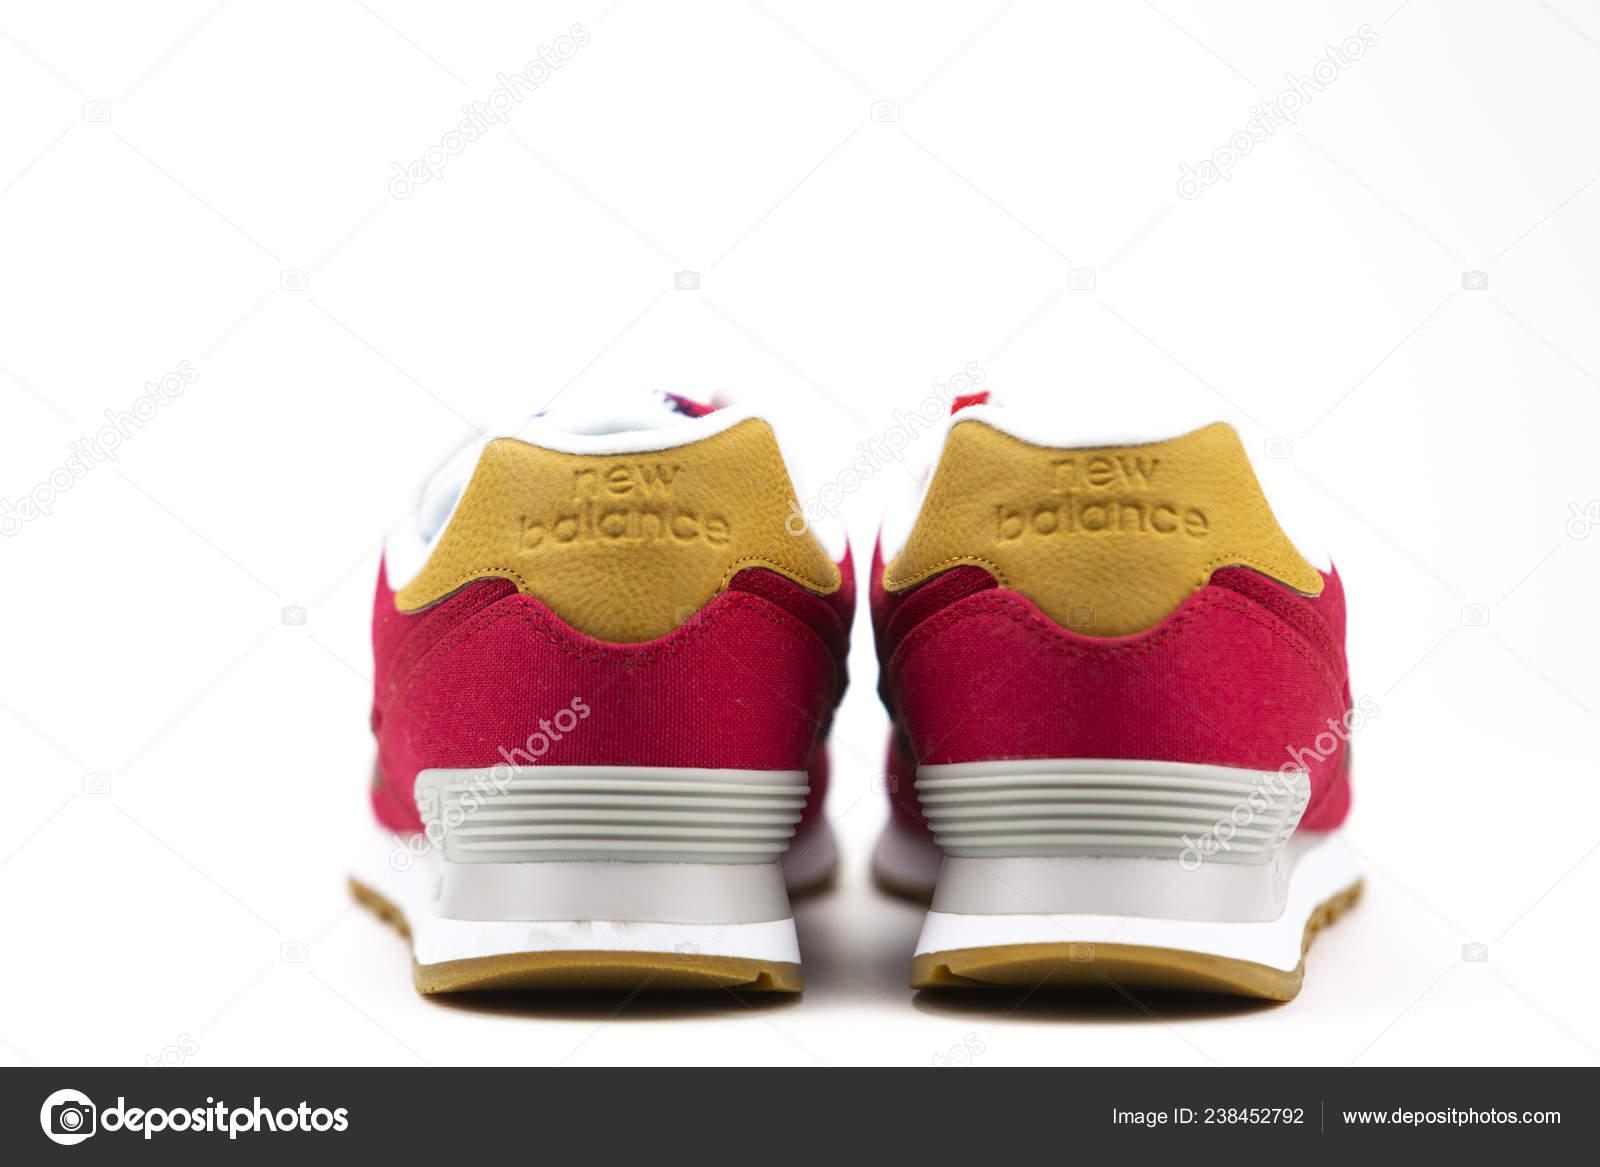 New Balance 574 Athletic Shoes Studio